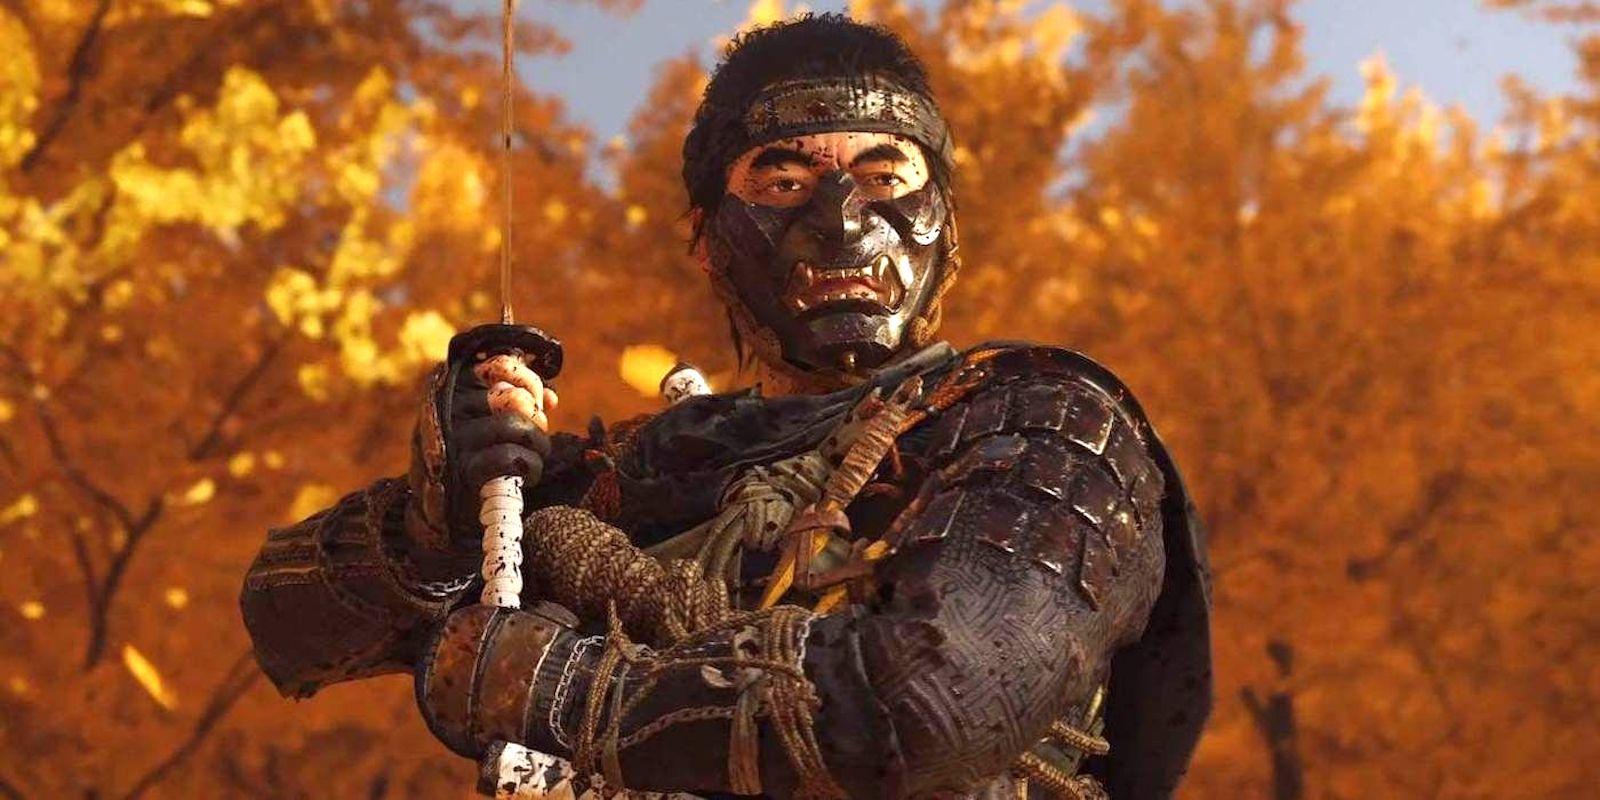 Recenzja Ghost of Tsushima - samuraj zawstydza asasynów